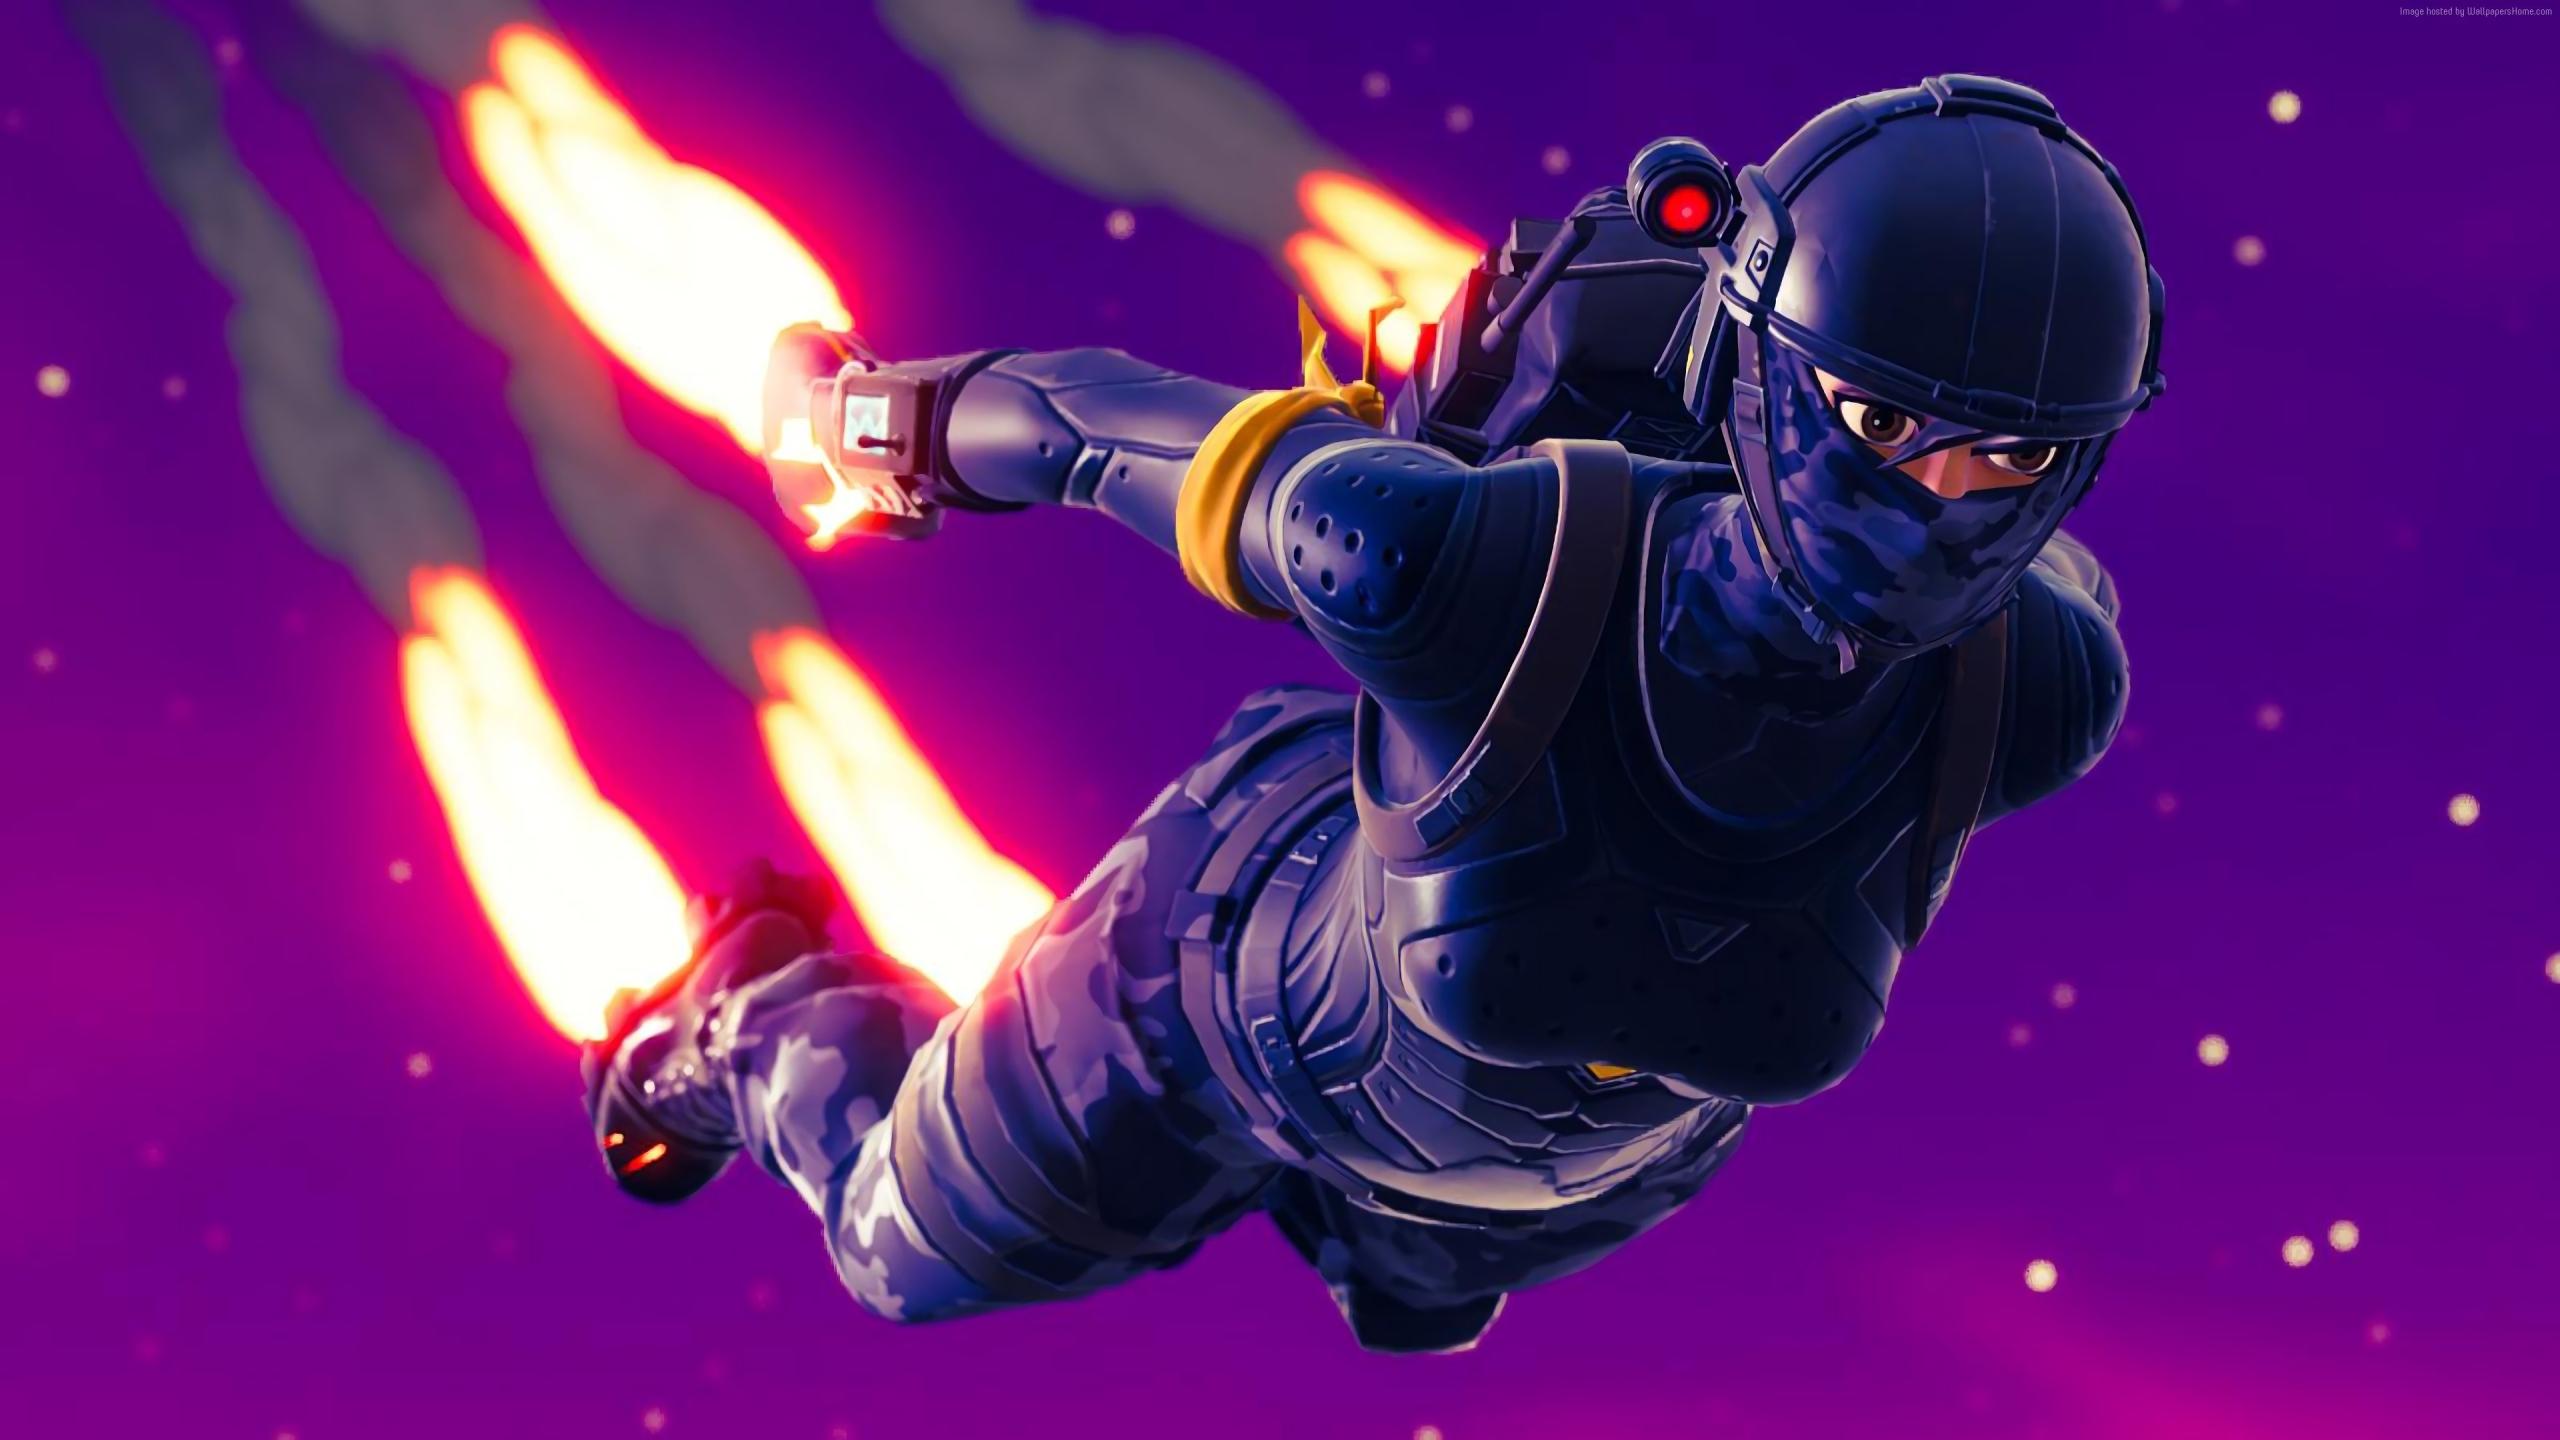 2560x1440 Elite Agent Skydiving Fortnite Battle Royale